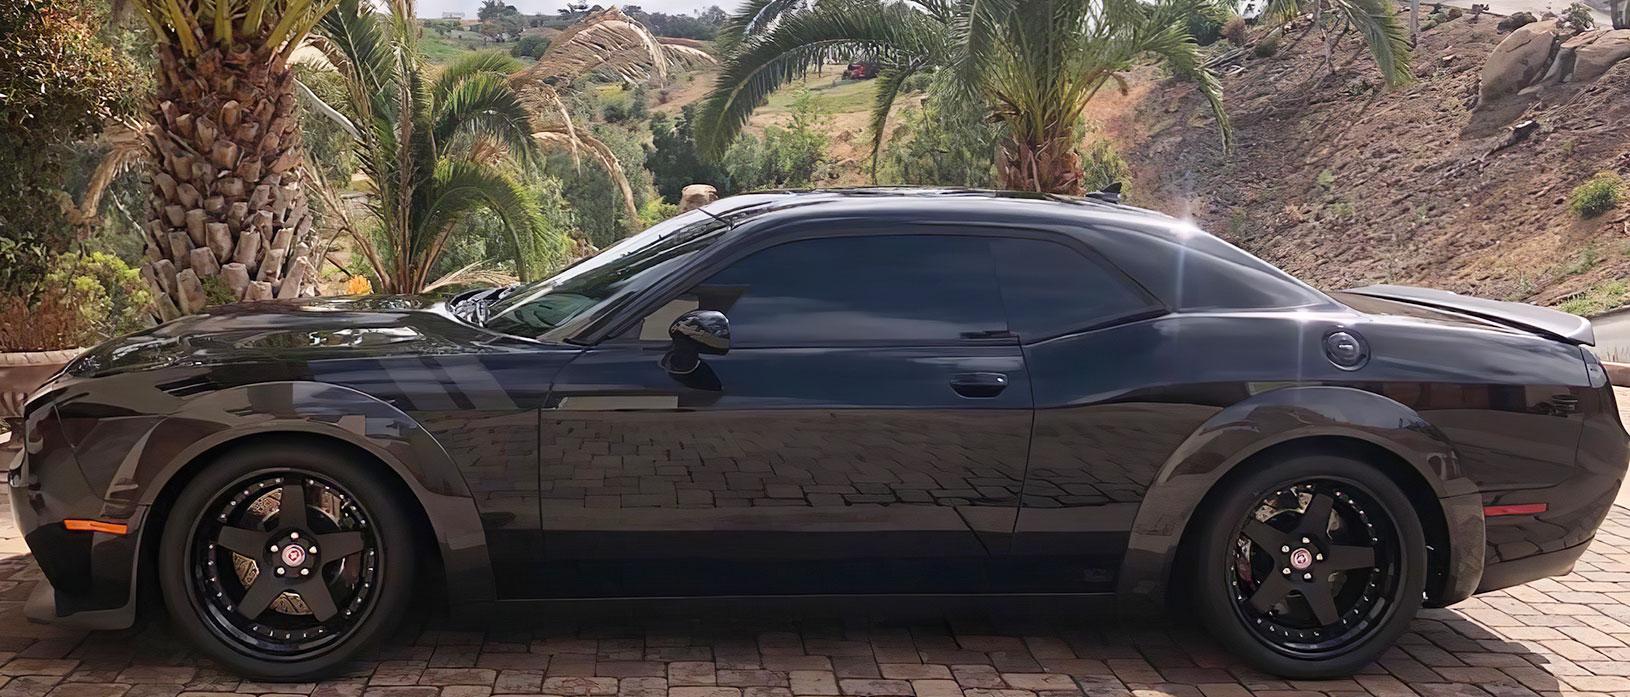 Black Dodge Challenger SRT Hellcat Widebody in carbon fiber